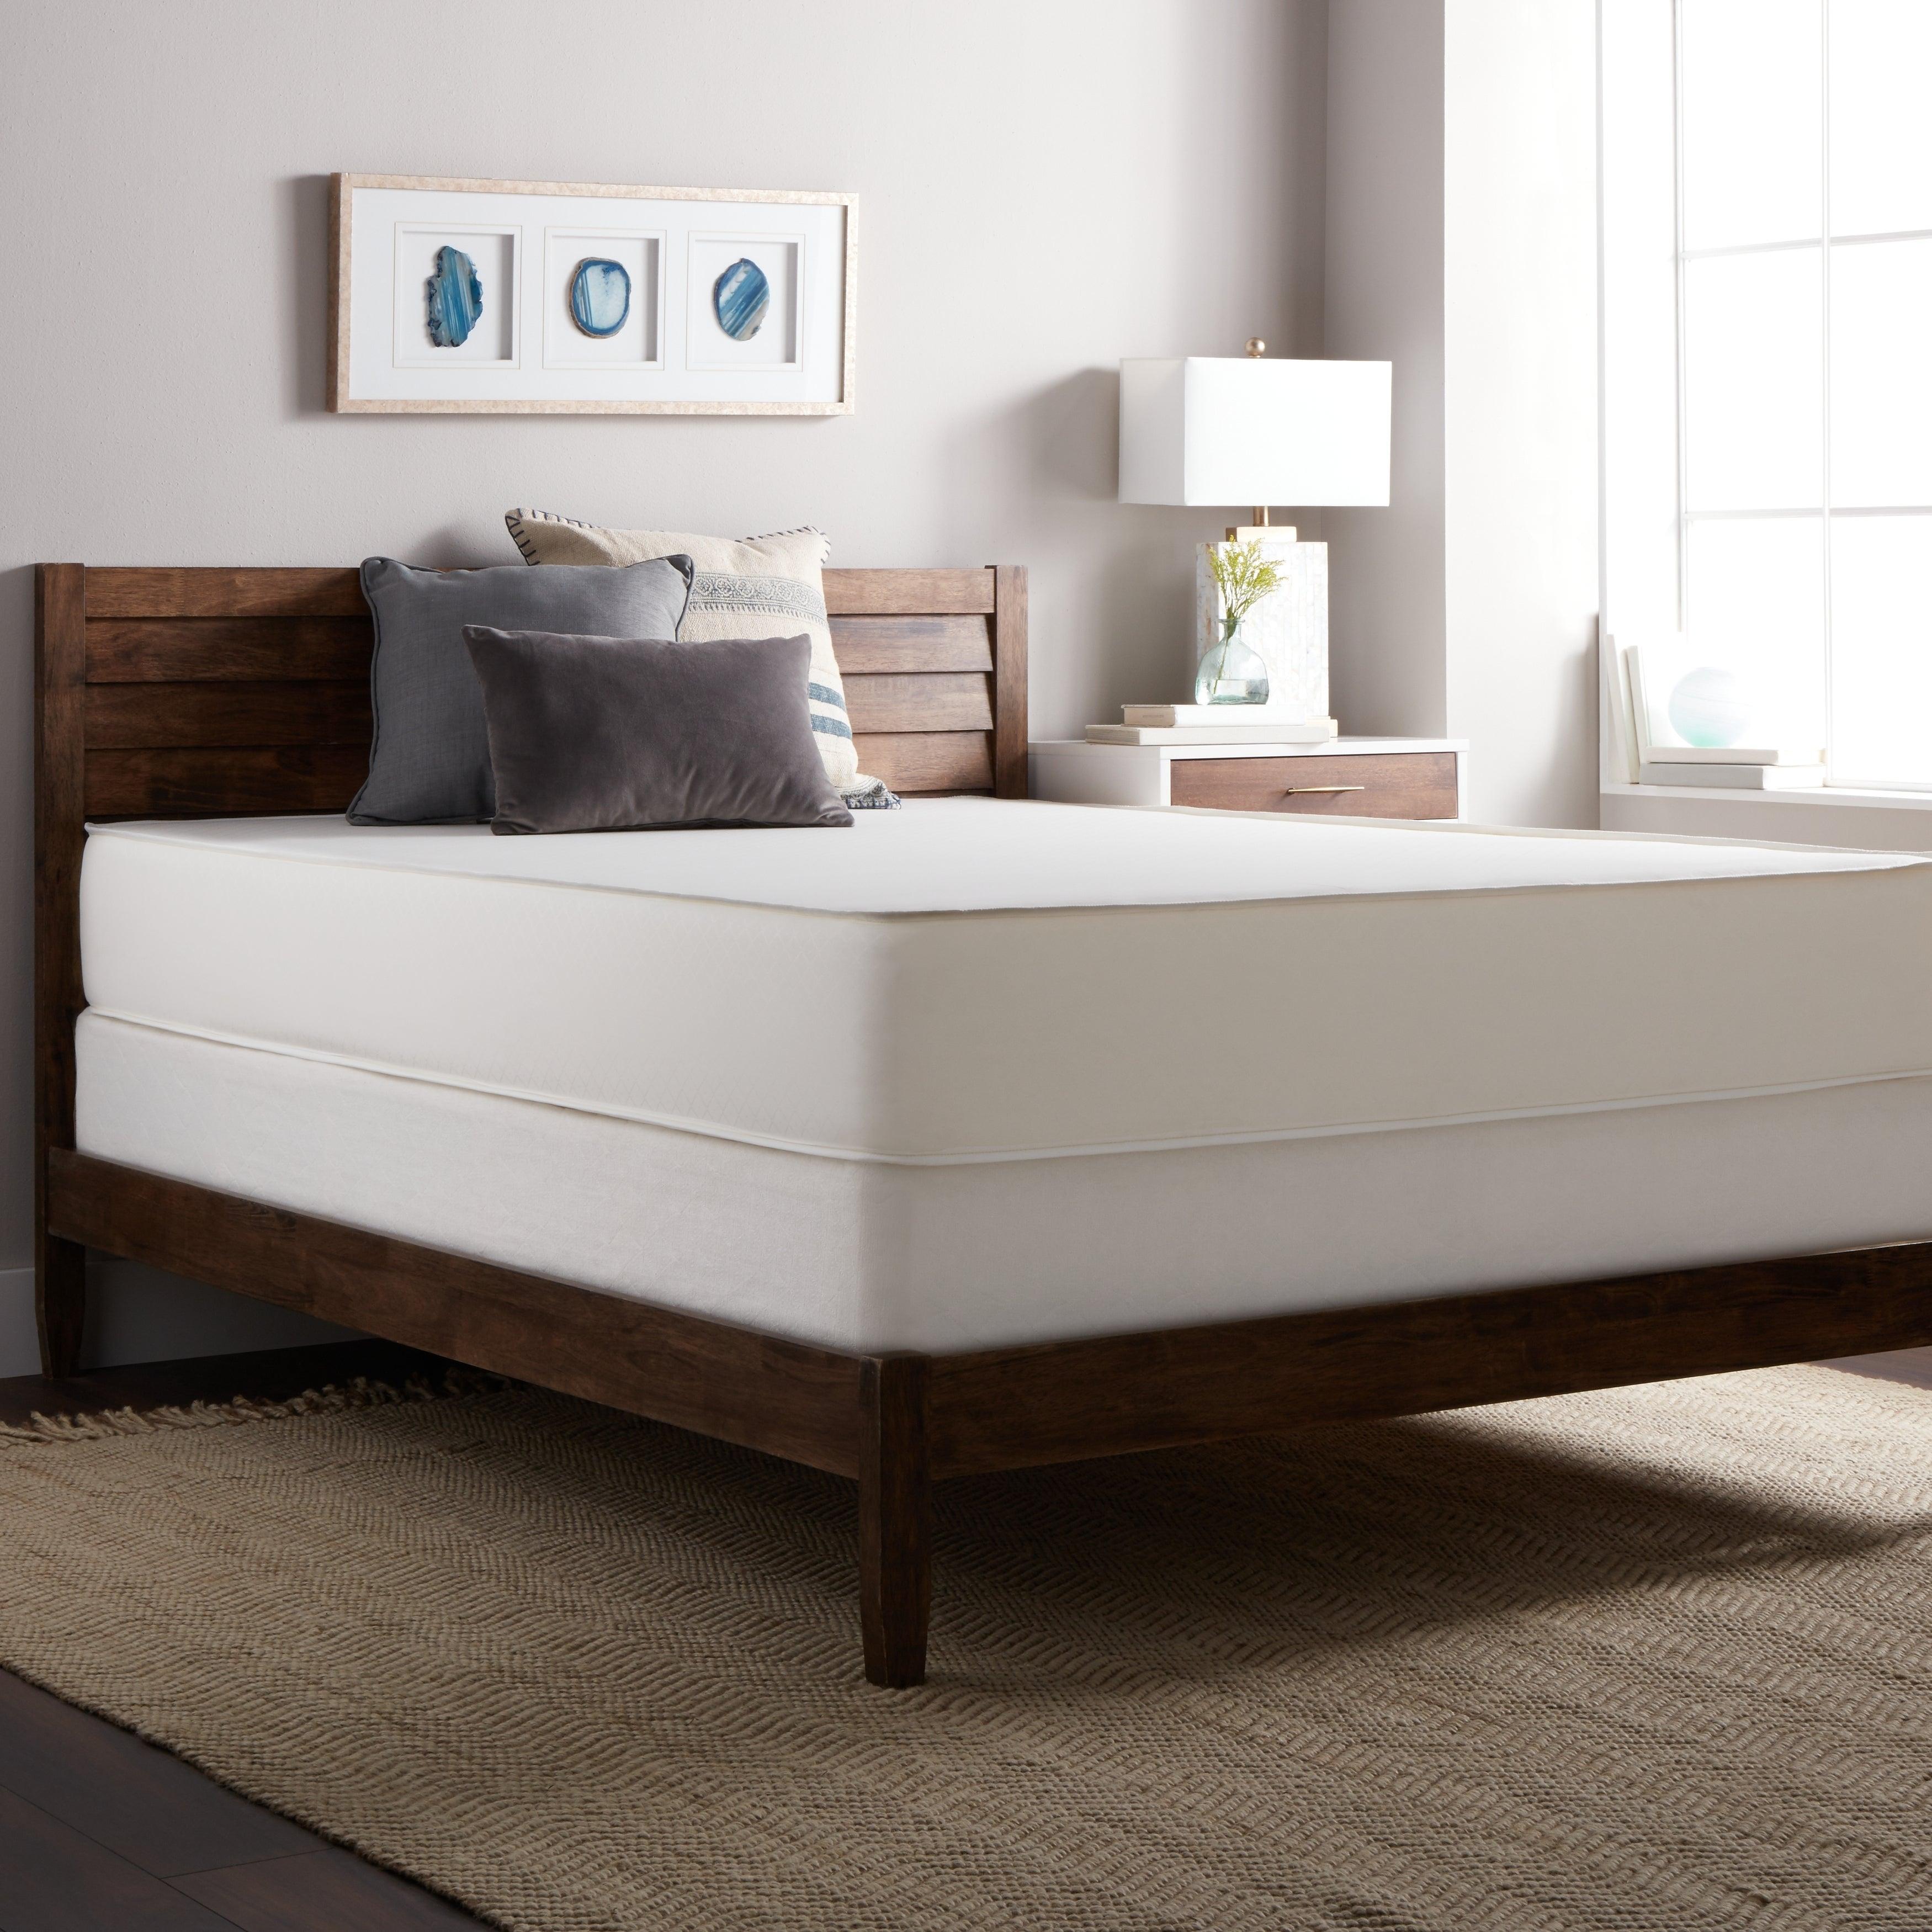 Select Luxury Flippable Firm 10-inch Queen Size Foam Matt...